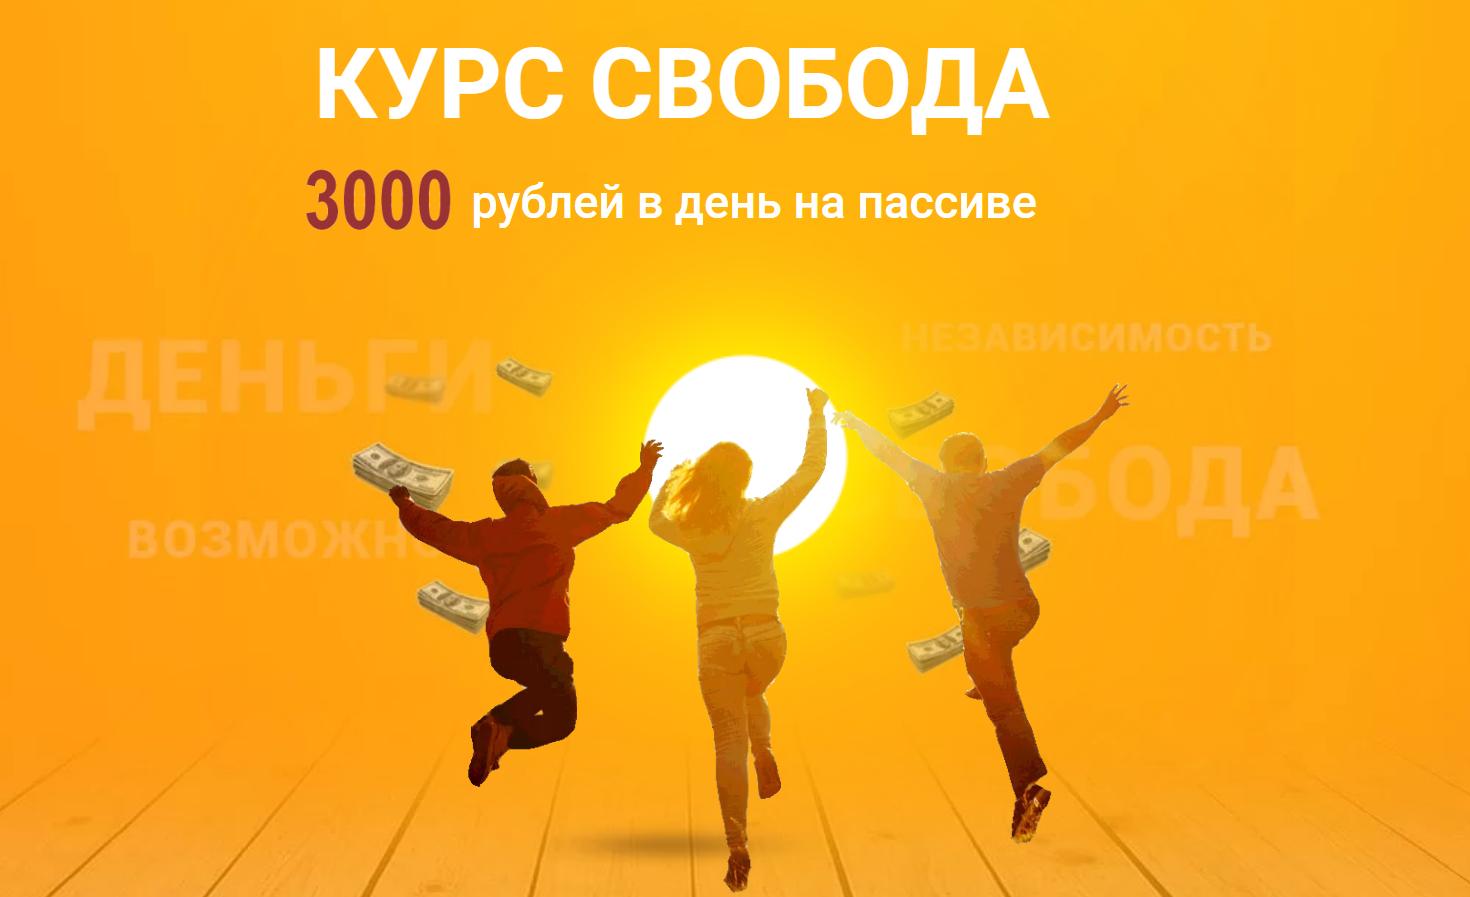 2020-02-16_18-00-19